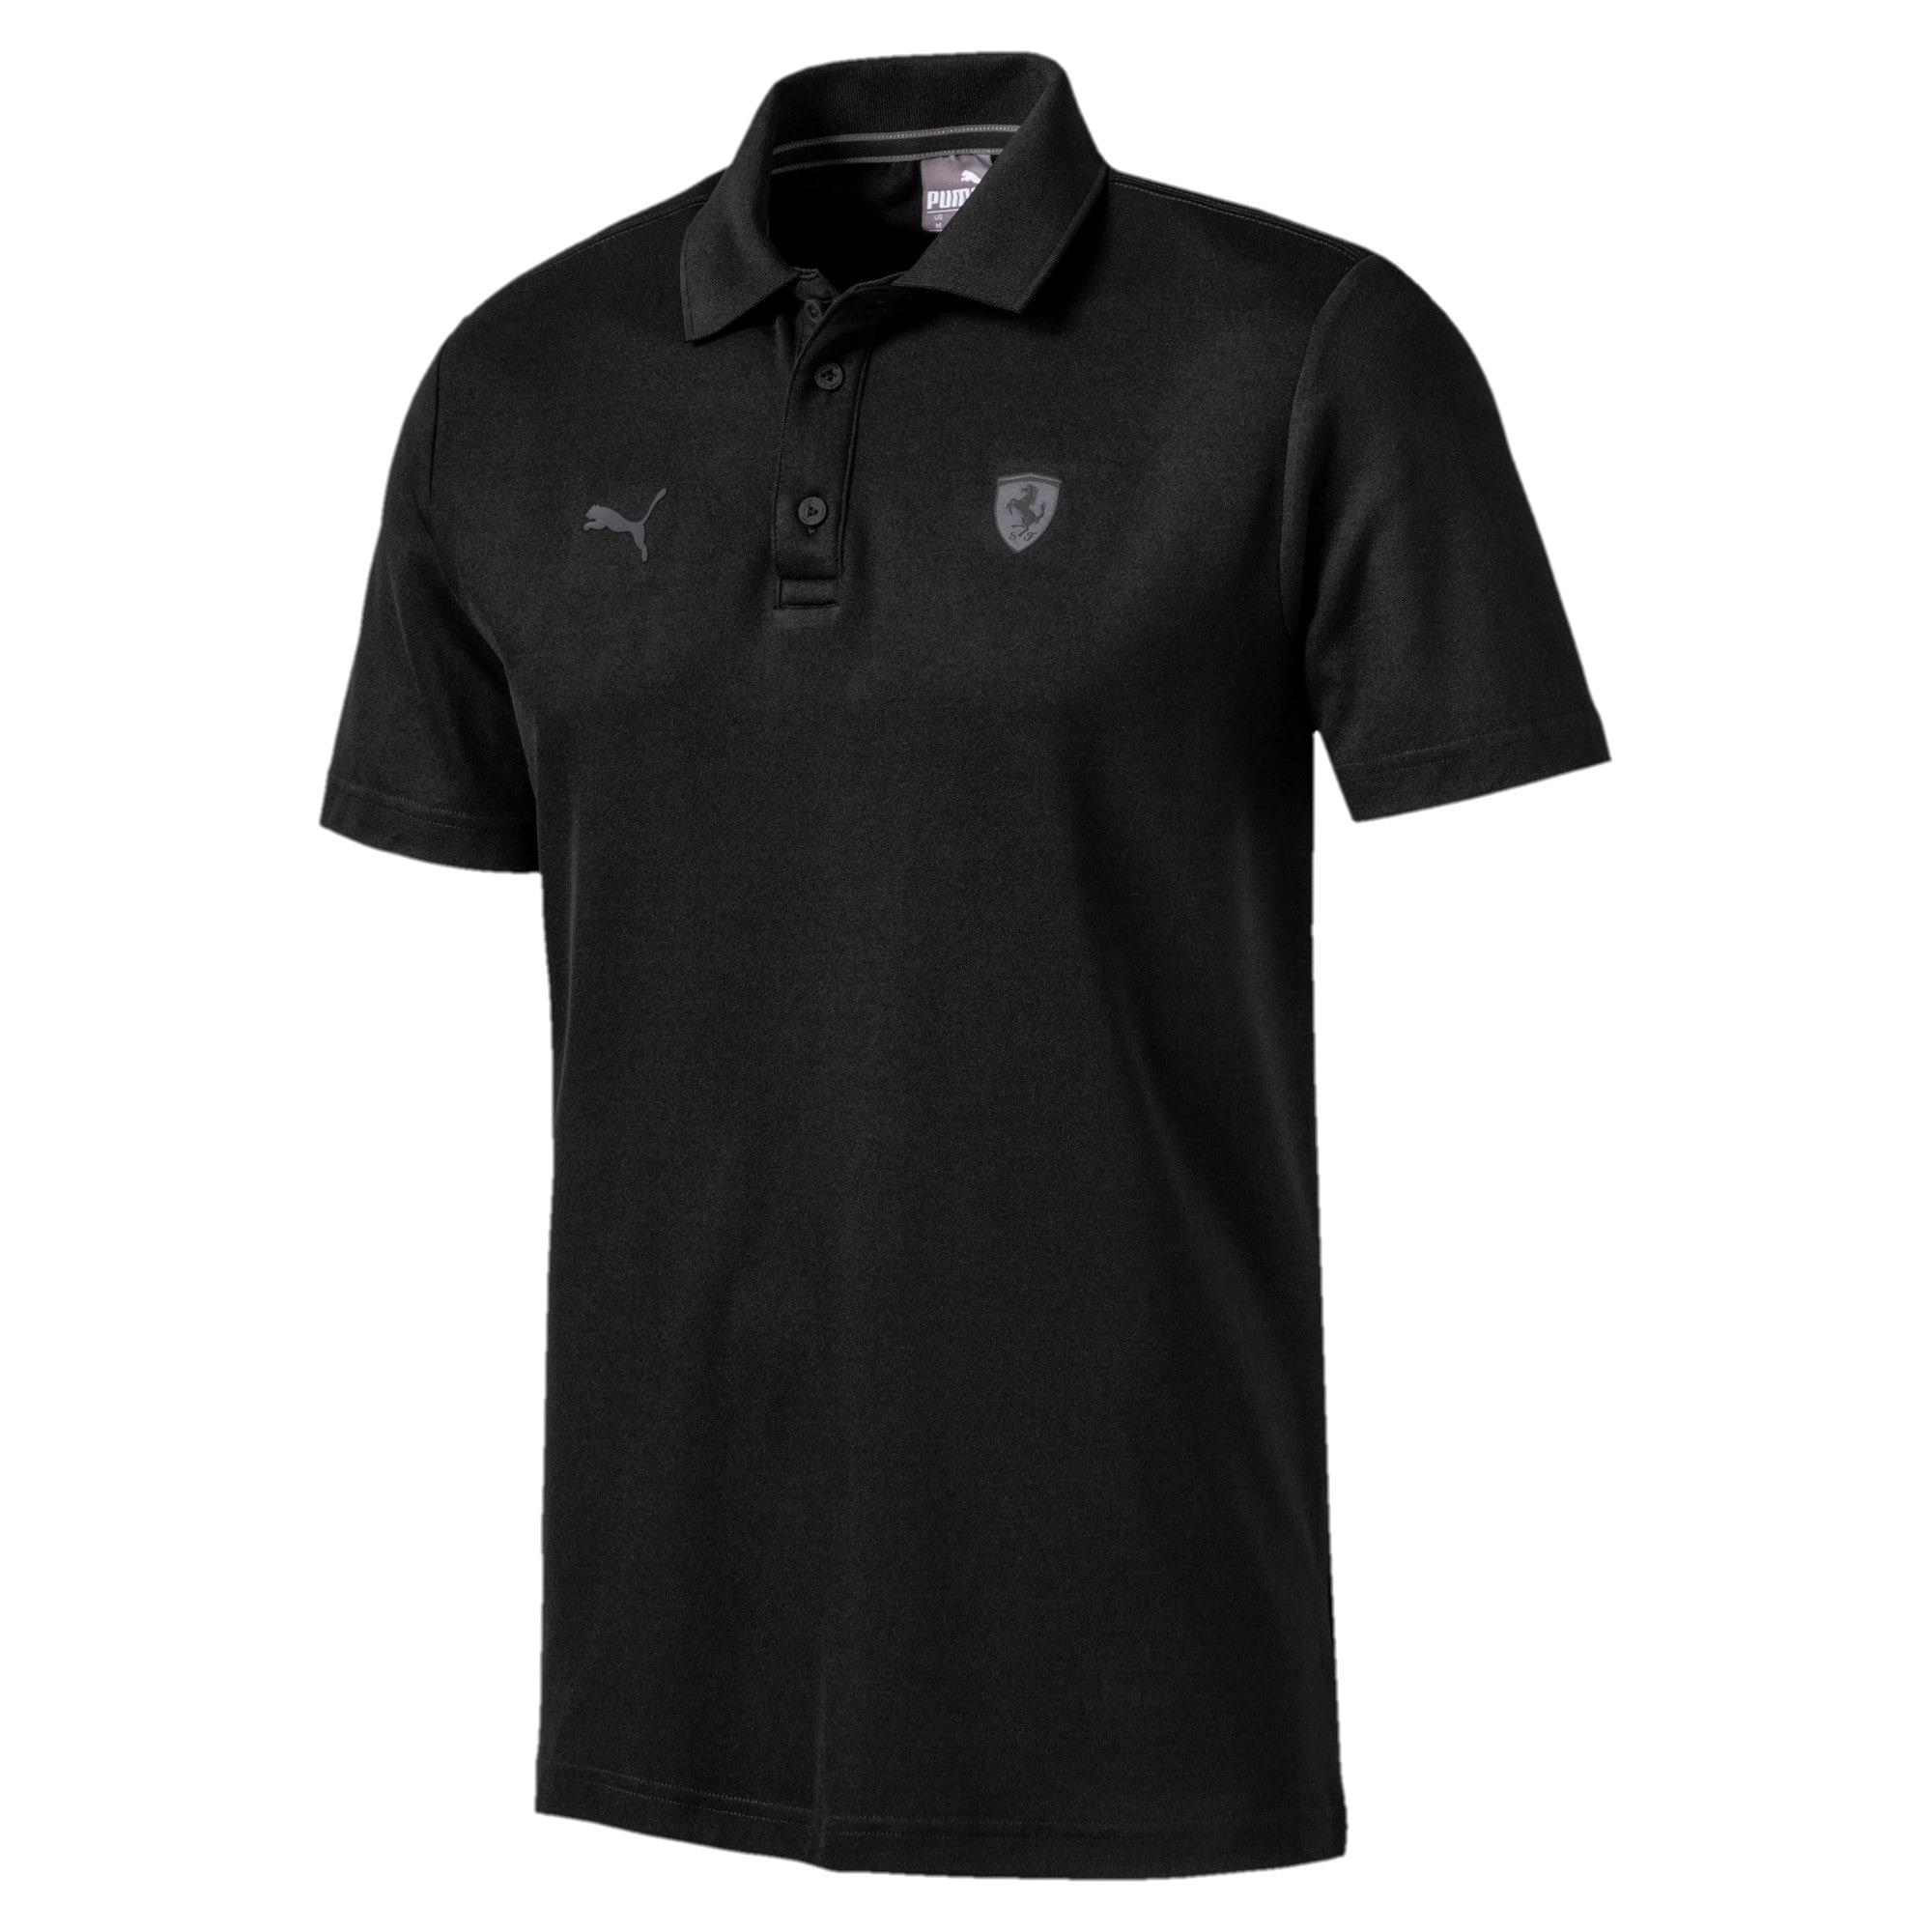 Thumbnail 5 of Ferrari Men's Polo Shirt, Puma Black, medium